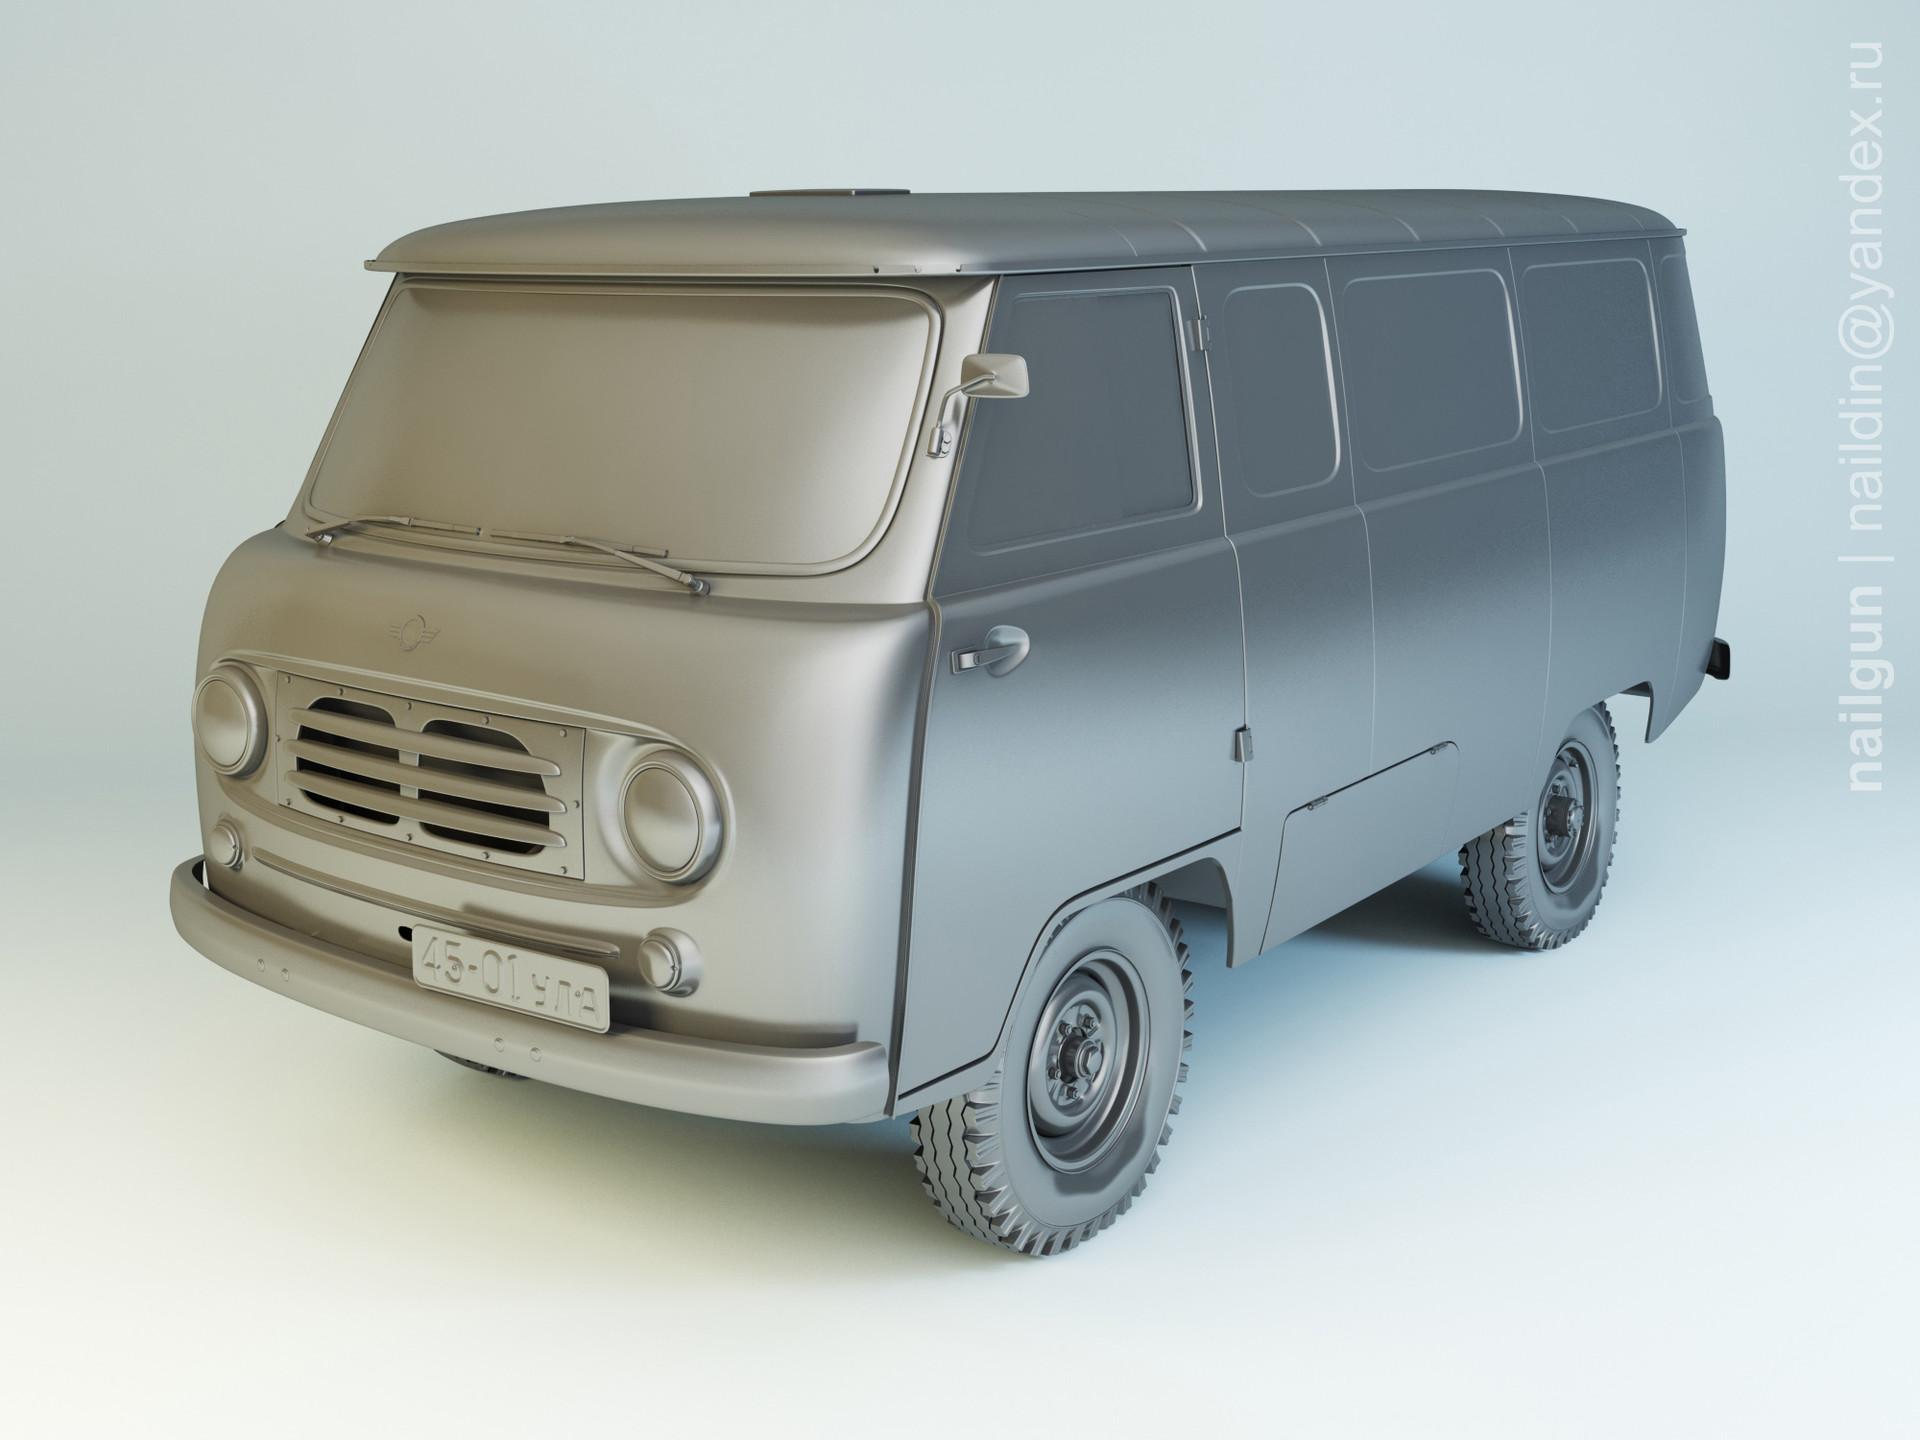 Nail khusnutdinov als 191 001 uaz 450 modelling 0